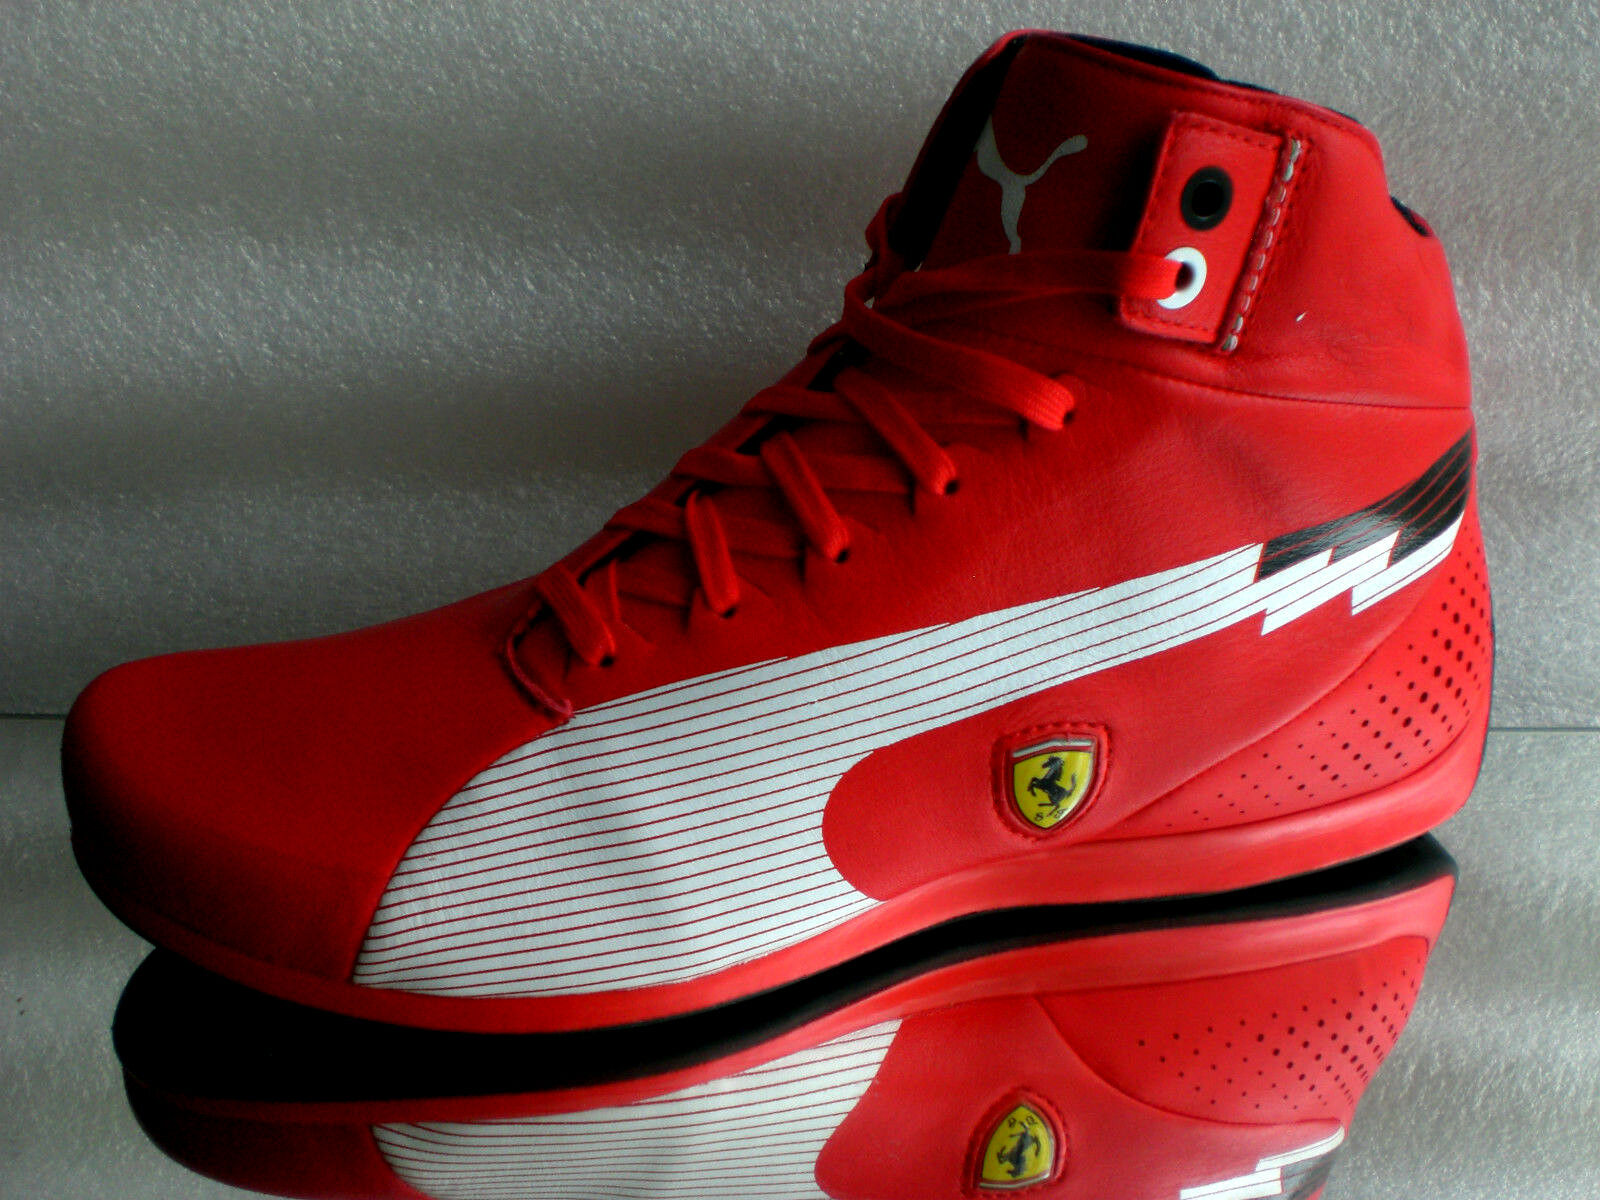 Original Puma Ferrari Gr: Speed Mid Men Sneaker TurnLaufschuh Stiefel Gr: Ferrari 39-42 +Bag 122a76